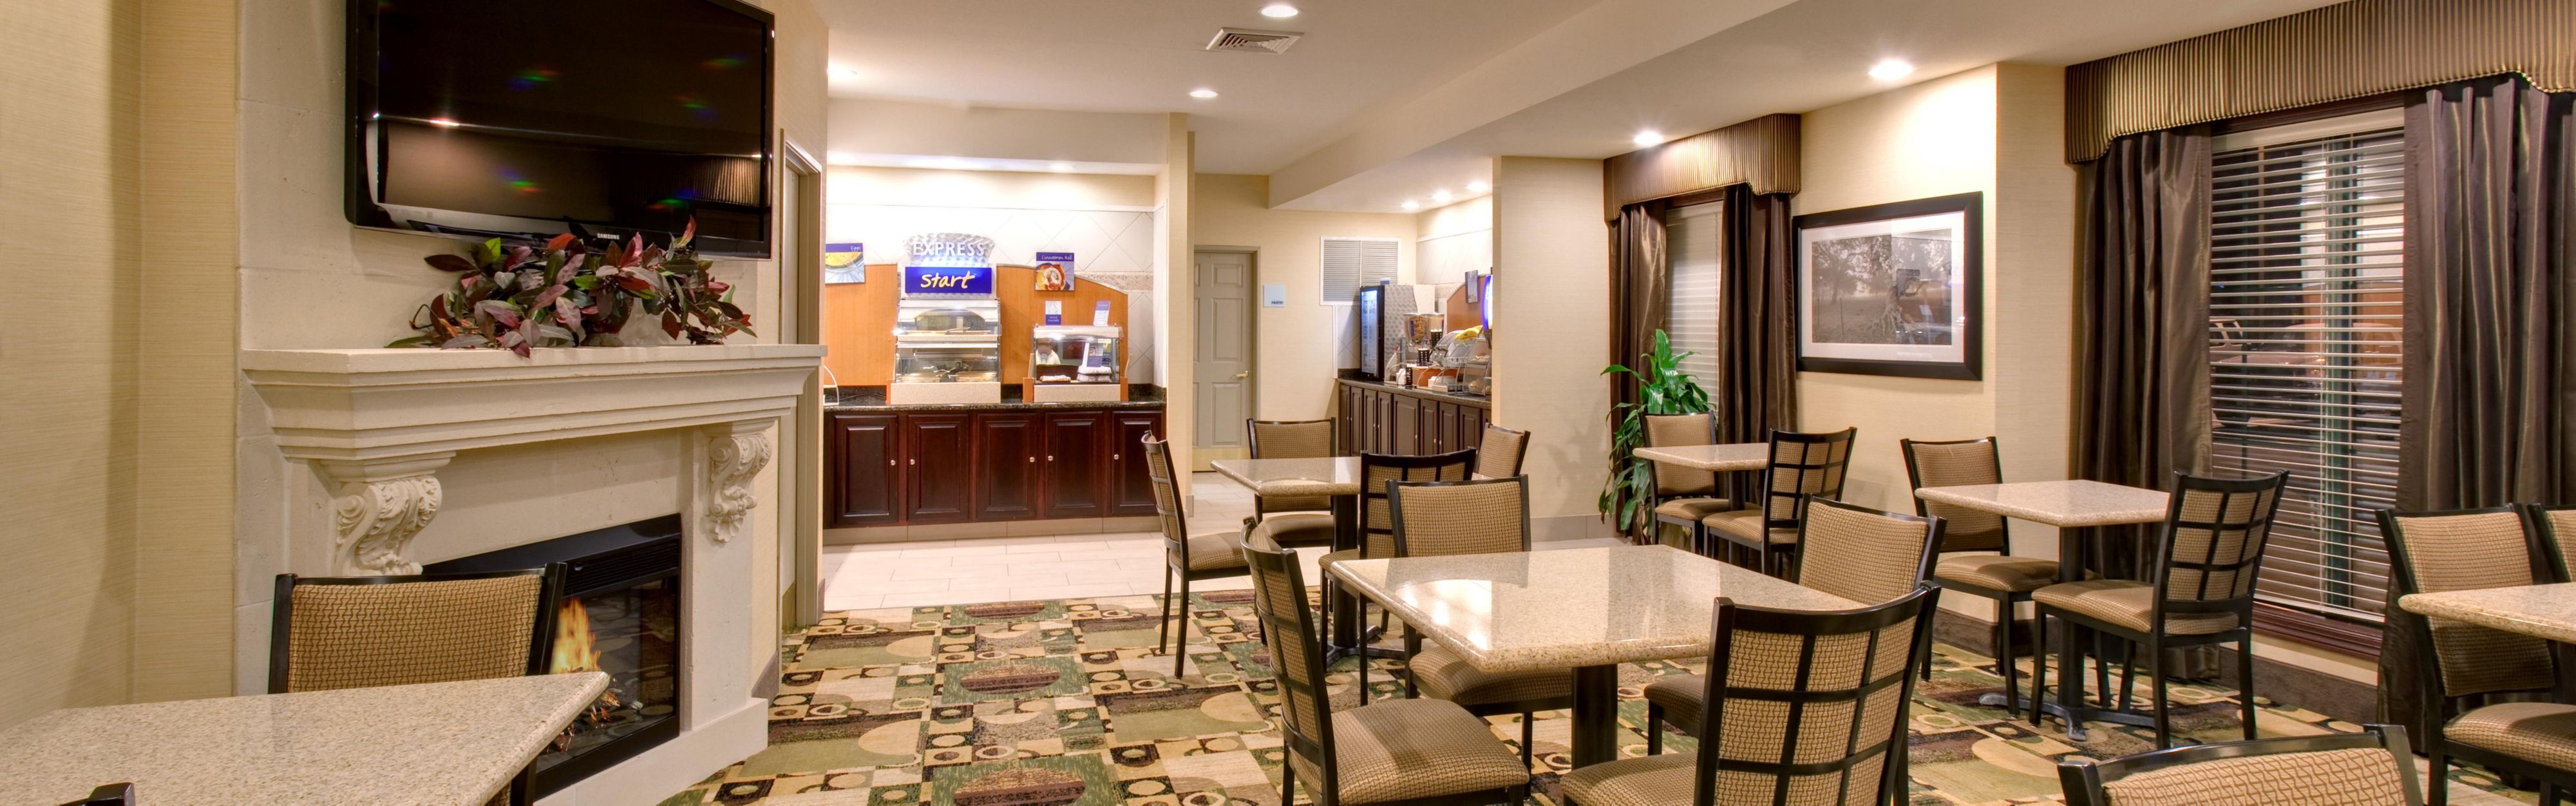 Holiday Inn Express & Suites Pleasant Prairie / Kenosha image 3